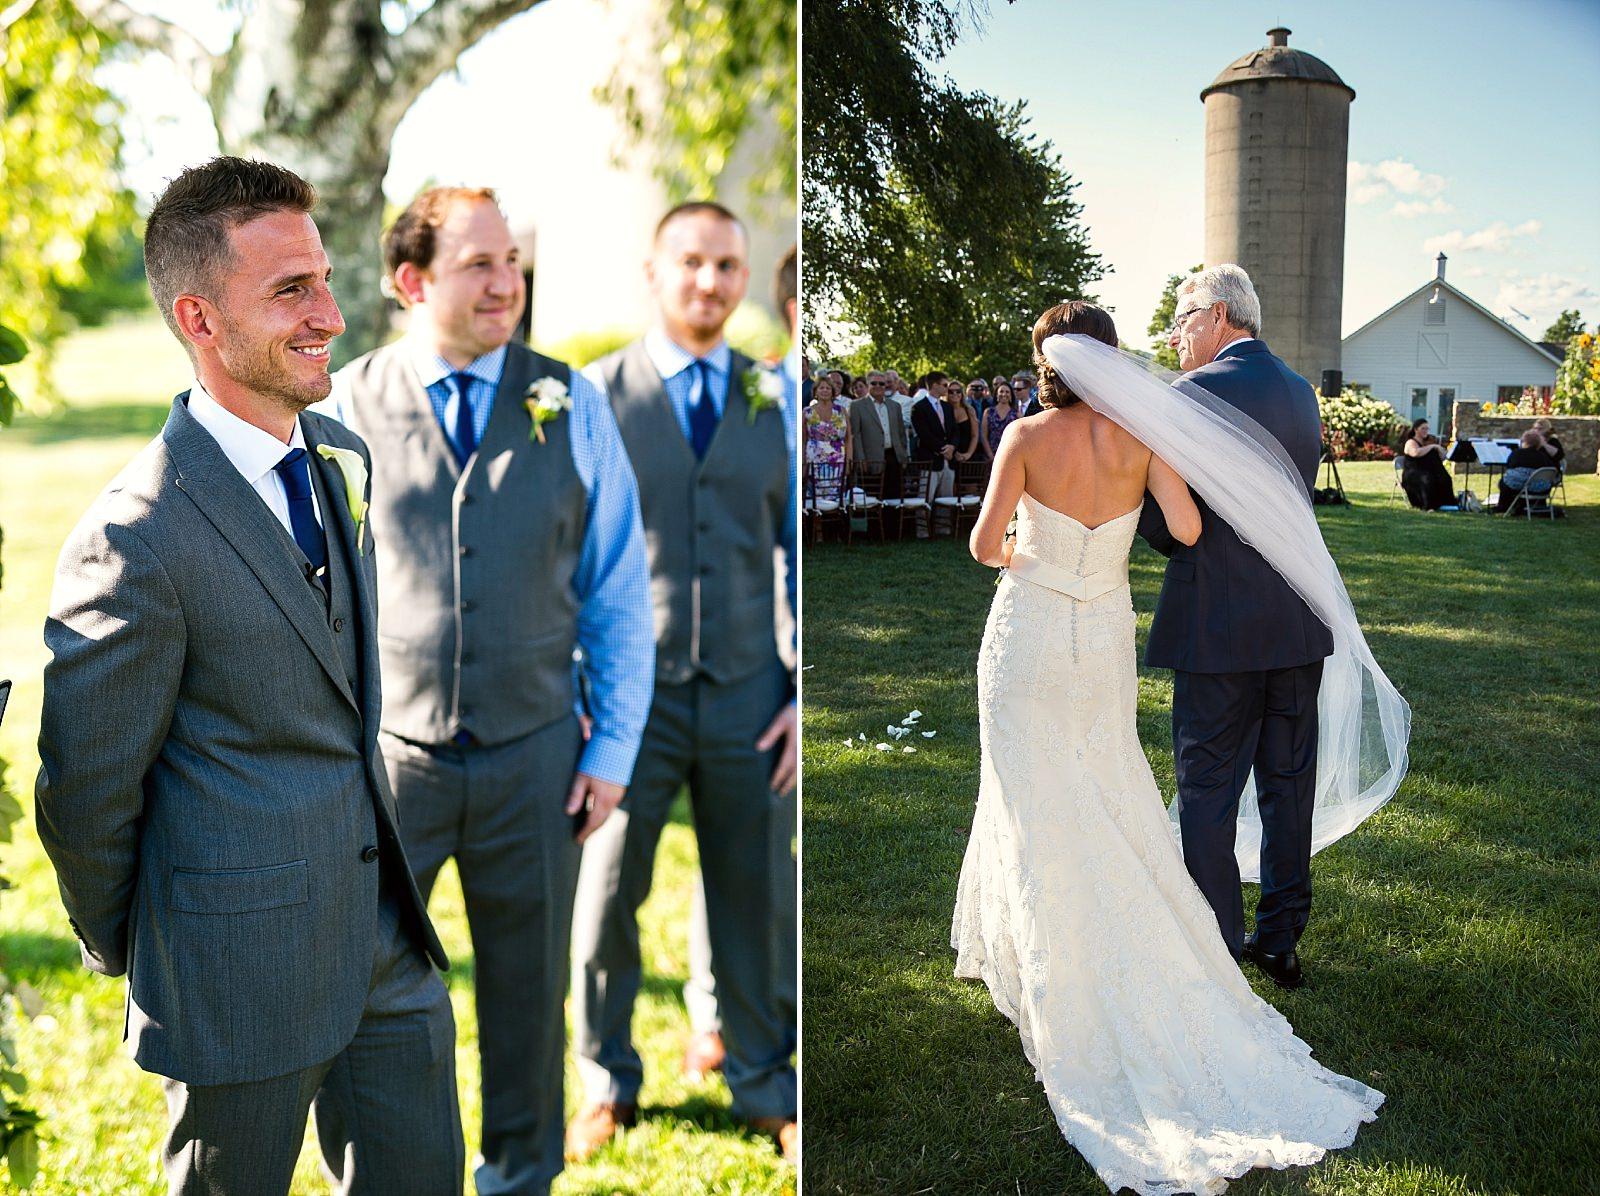 CT_Wedding_Photographer_LiNa_Wed_35.jpg